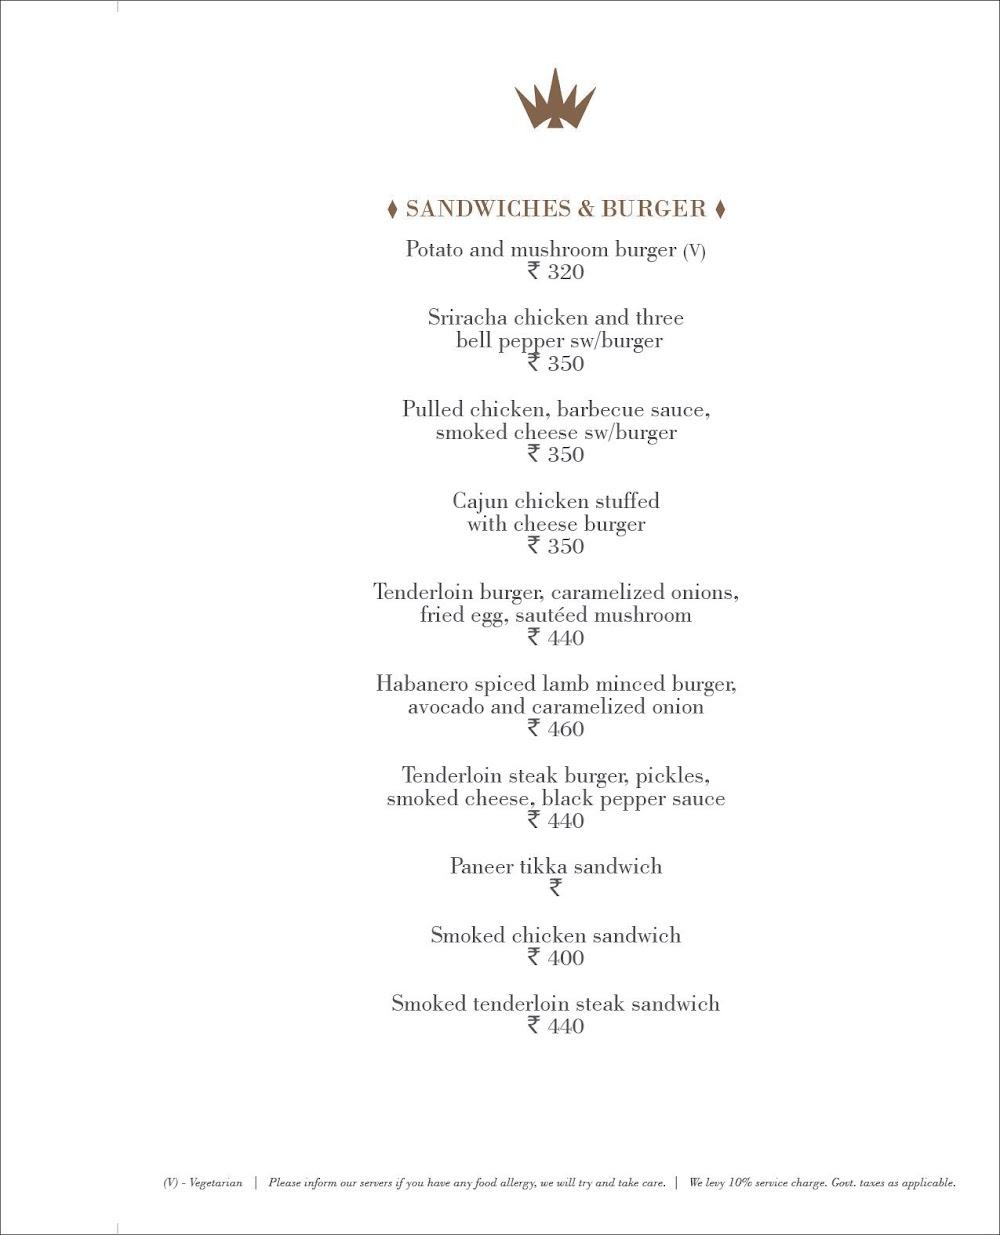 Pranzi menu 18